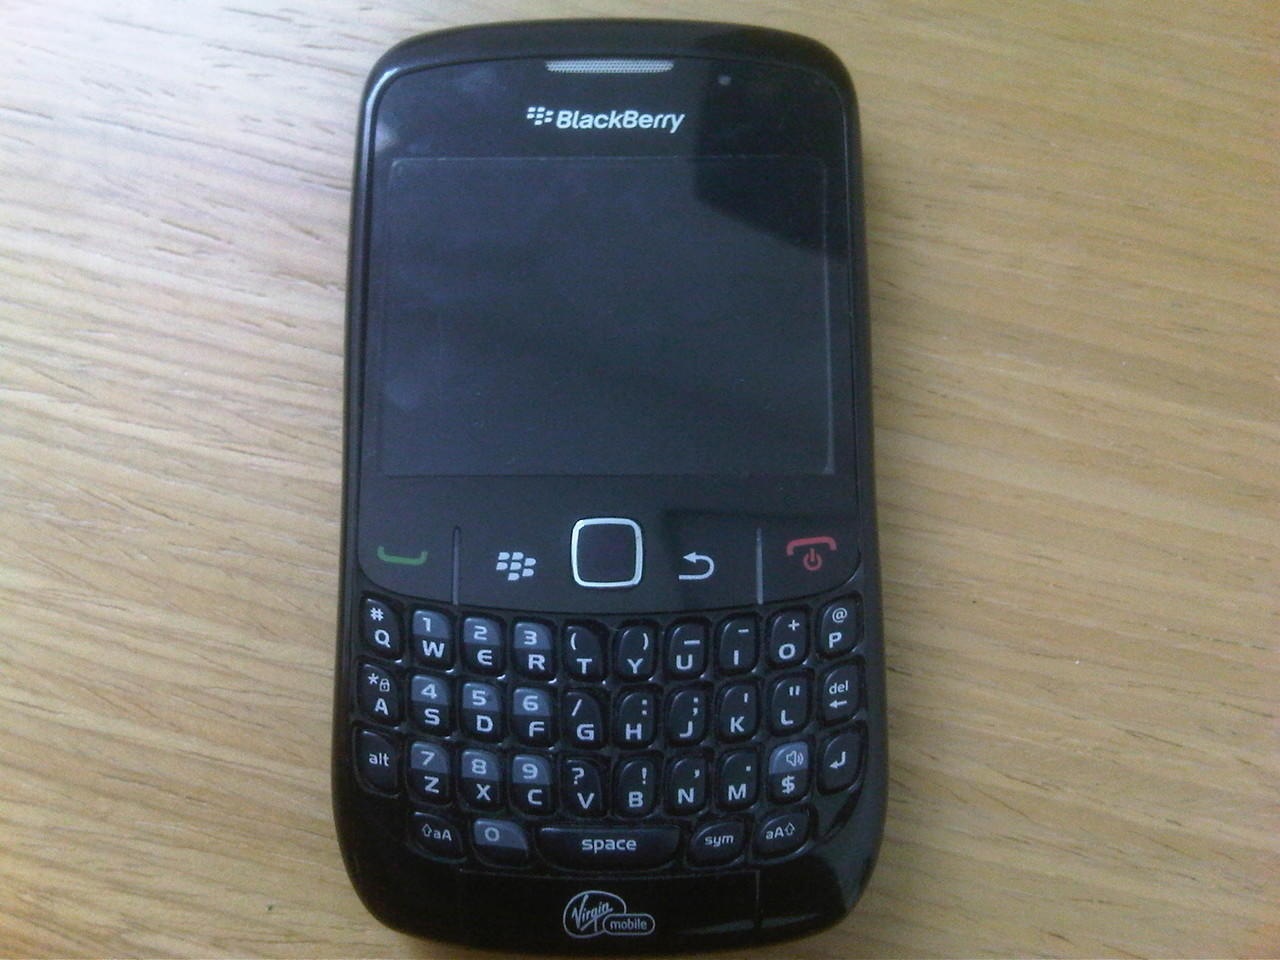 Jual Blackberry 8530 CDMA a.k.a ARIES Surabaya